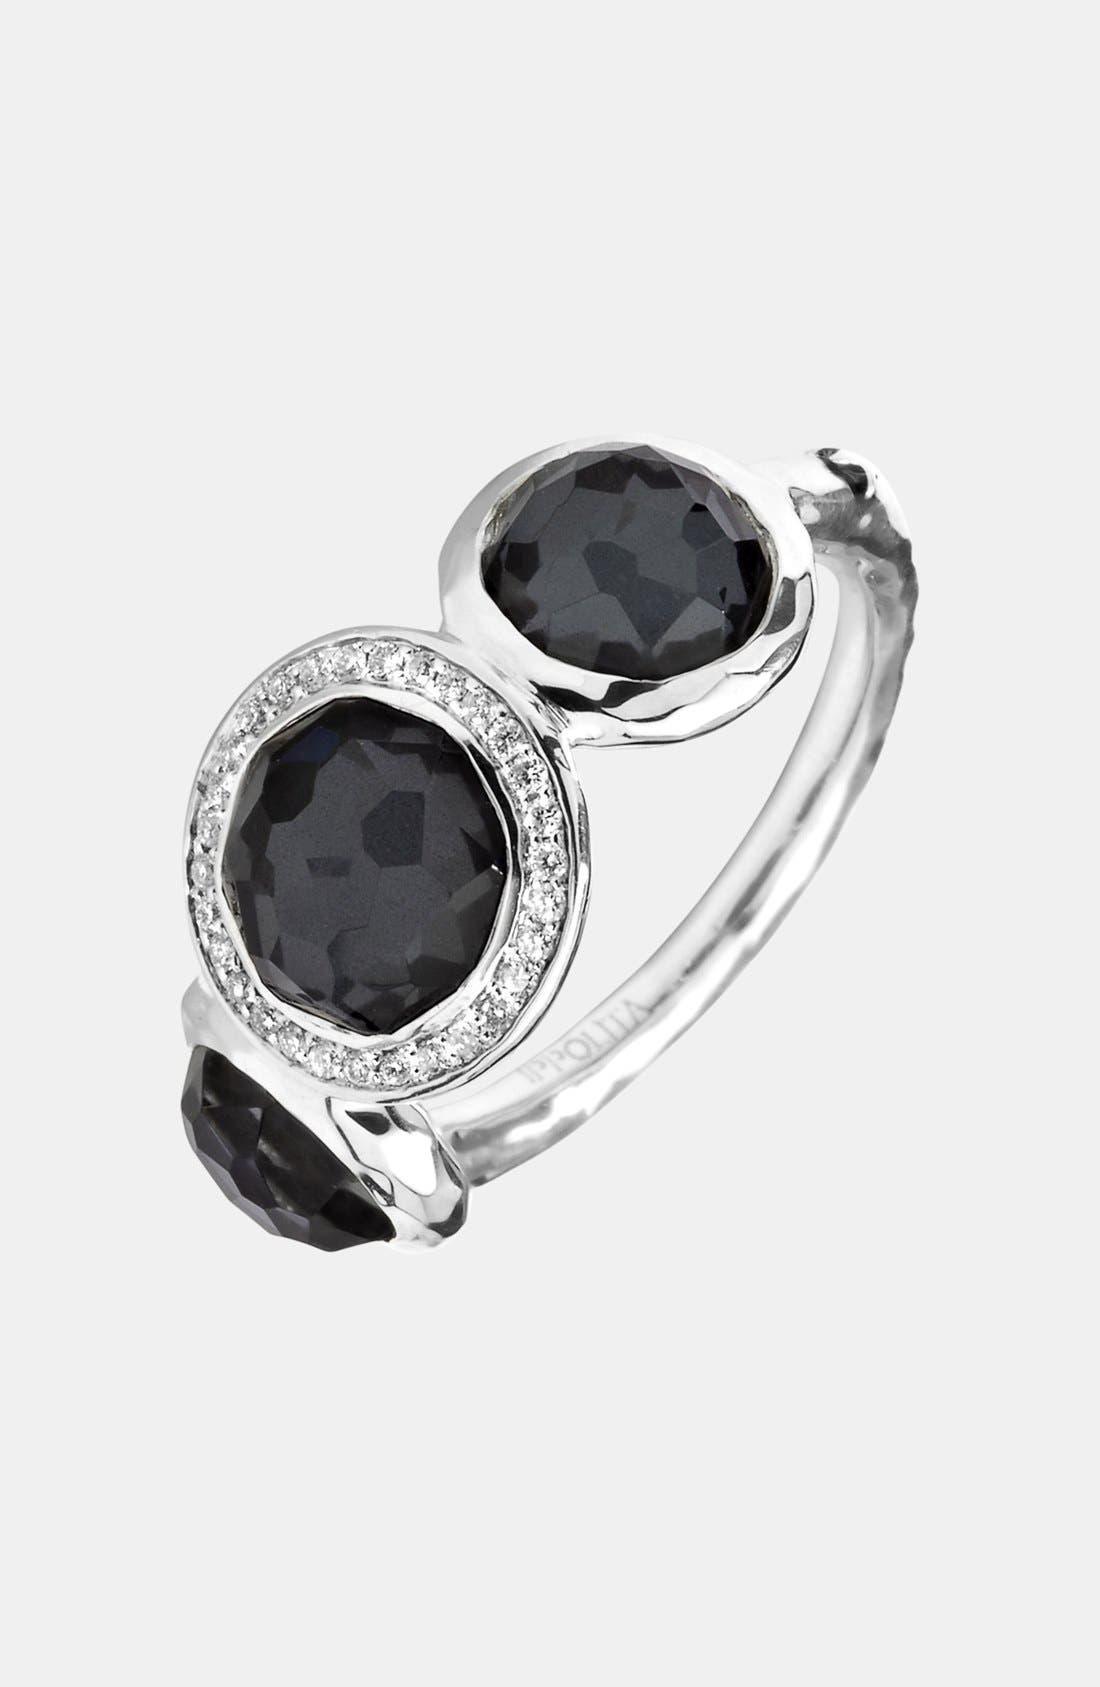 Main Image - Ippolita 'Stella - Lollipop' 3-Stone Ring with Diamonds